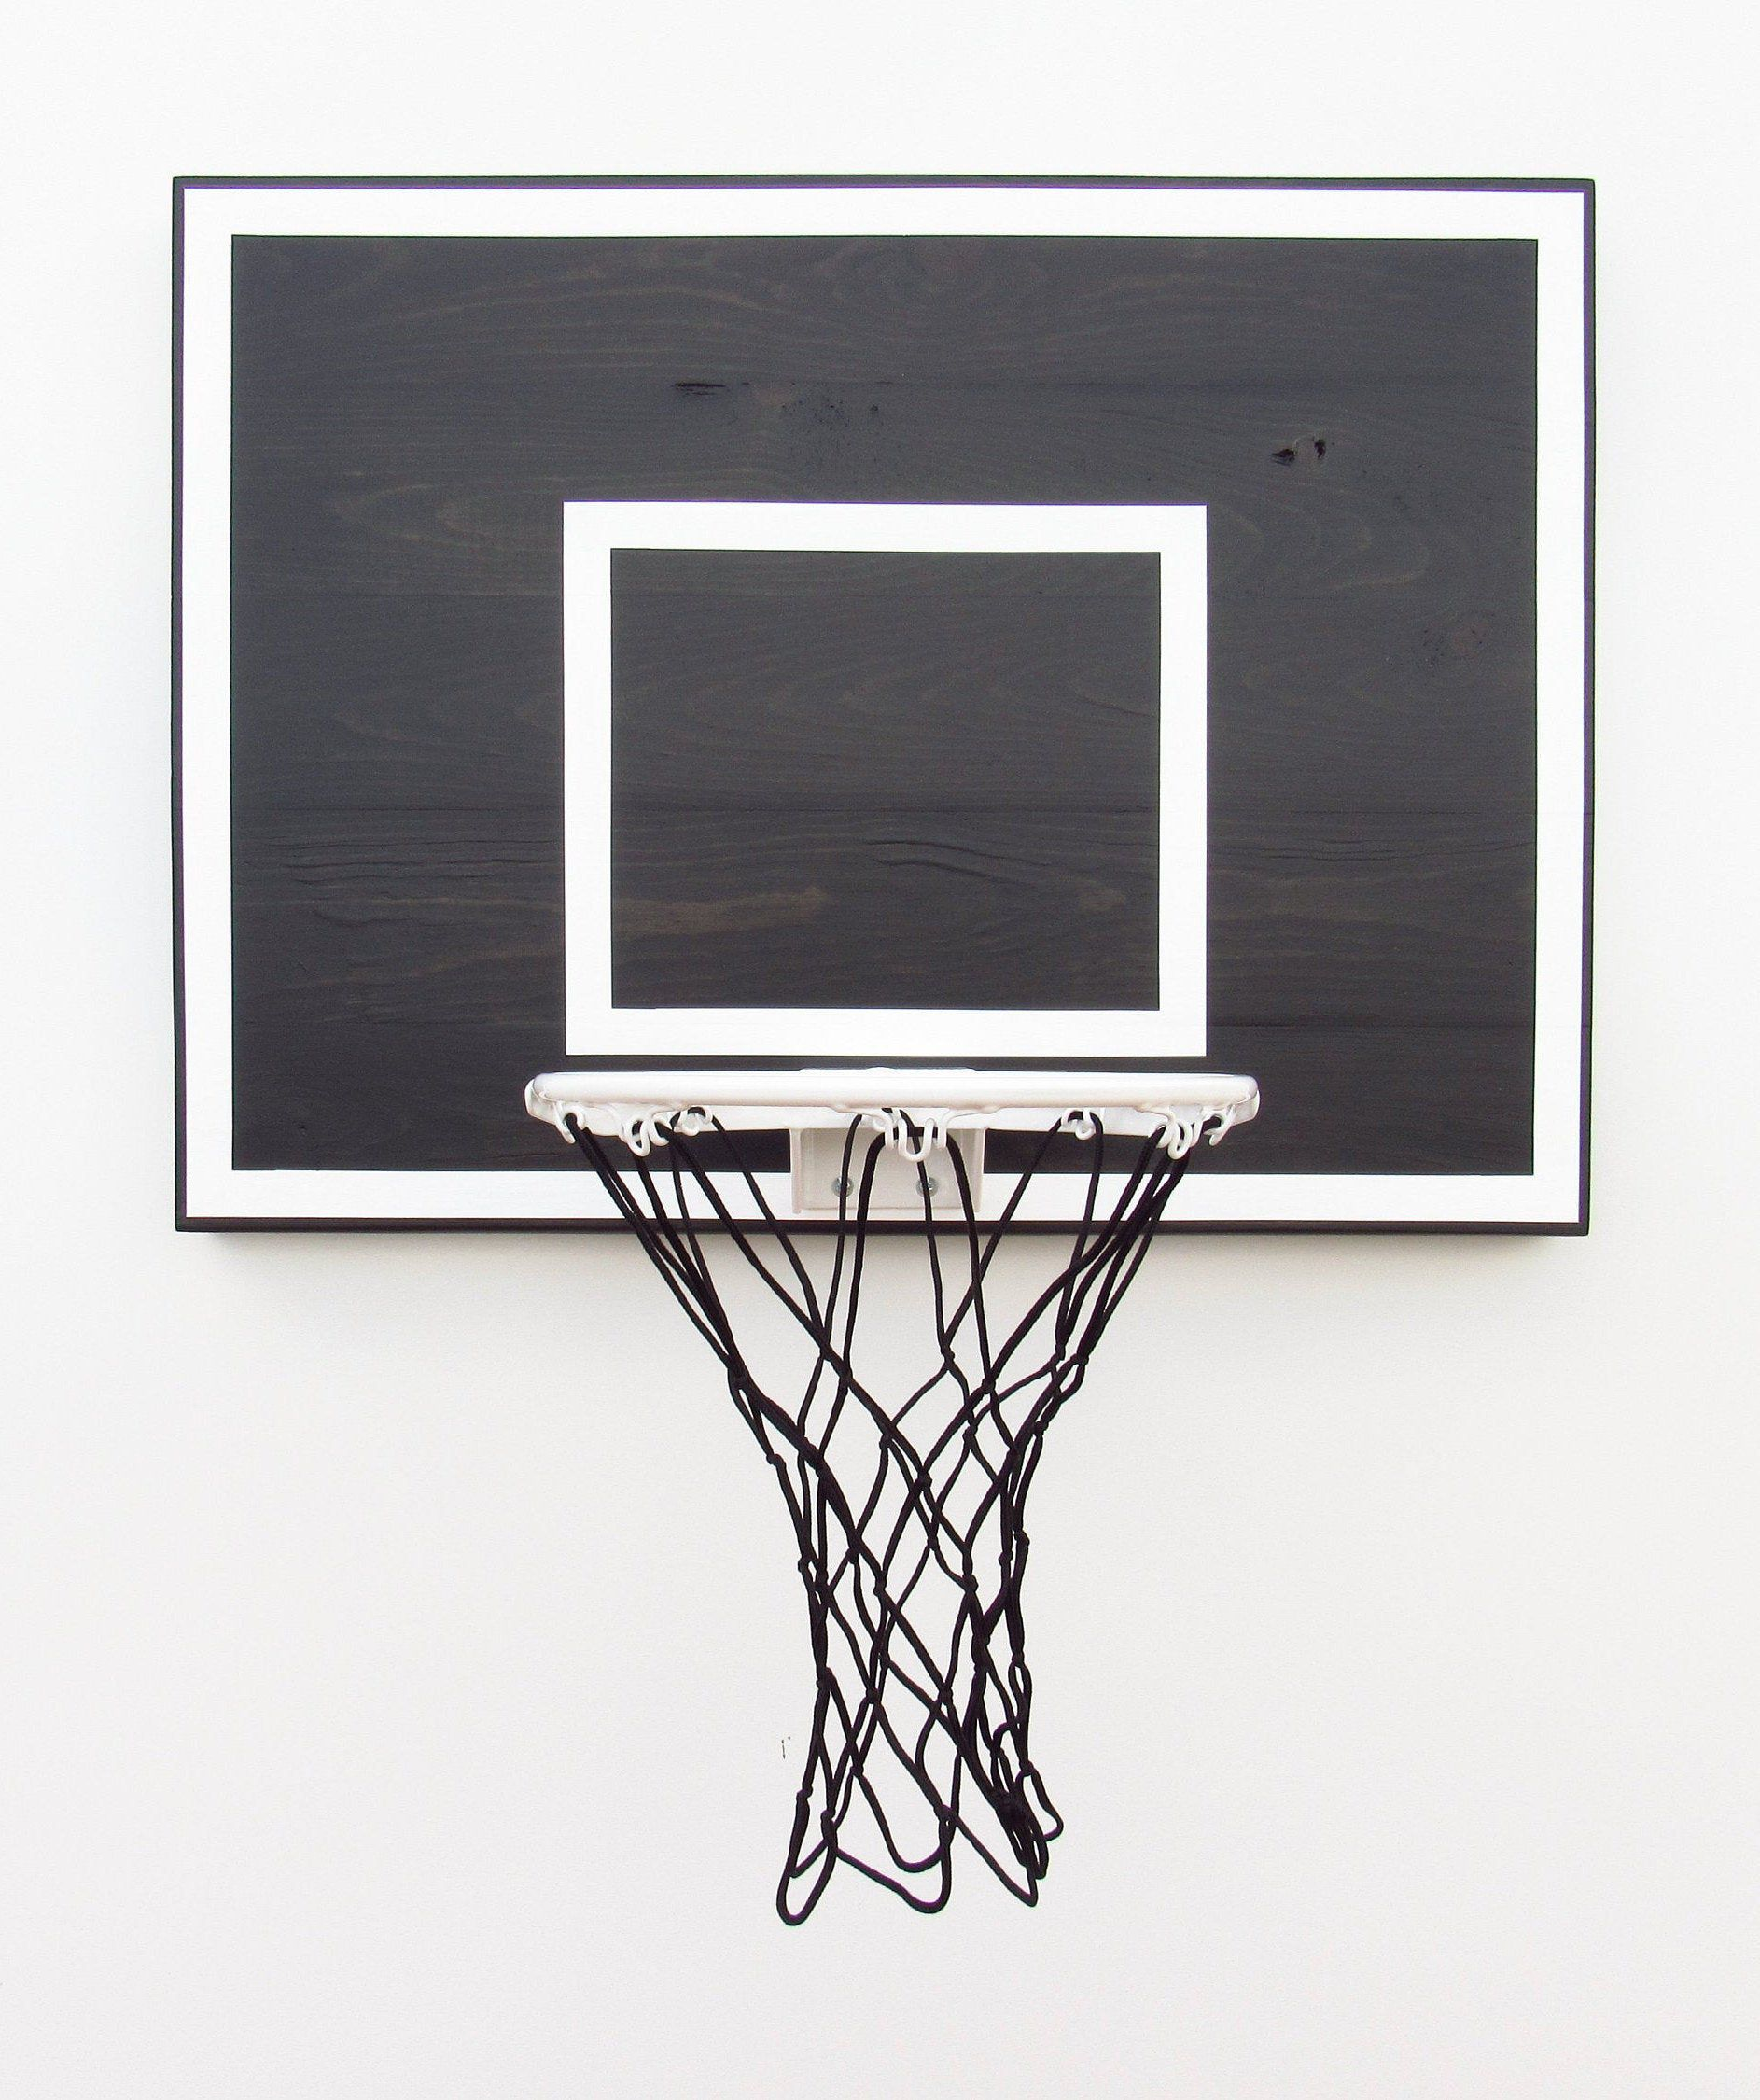 Black Wood Indoor Basketball Hoop With White Rim Indoor Basketball Hoop Basketball Hoop Indoor Basketball